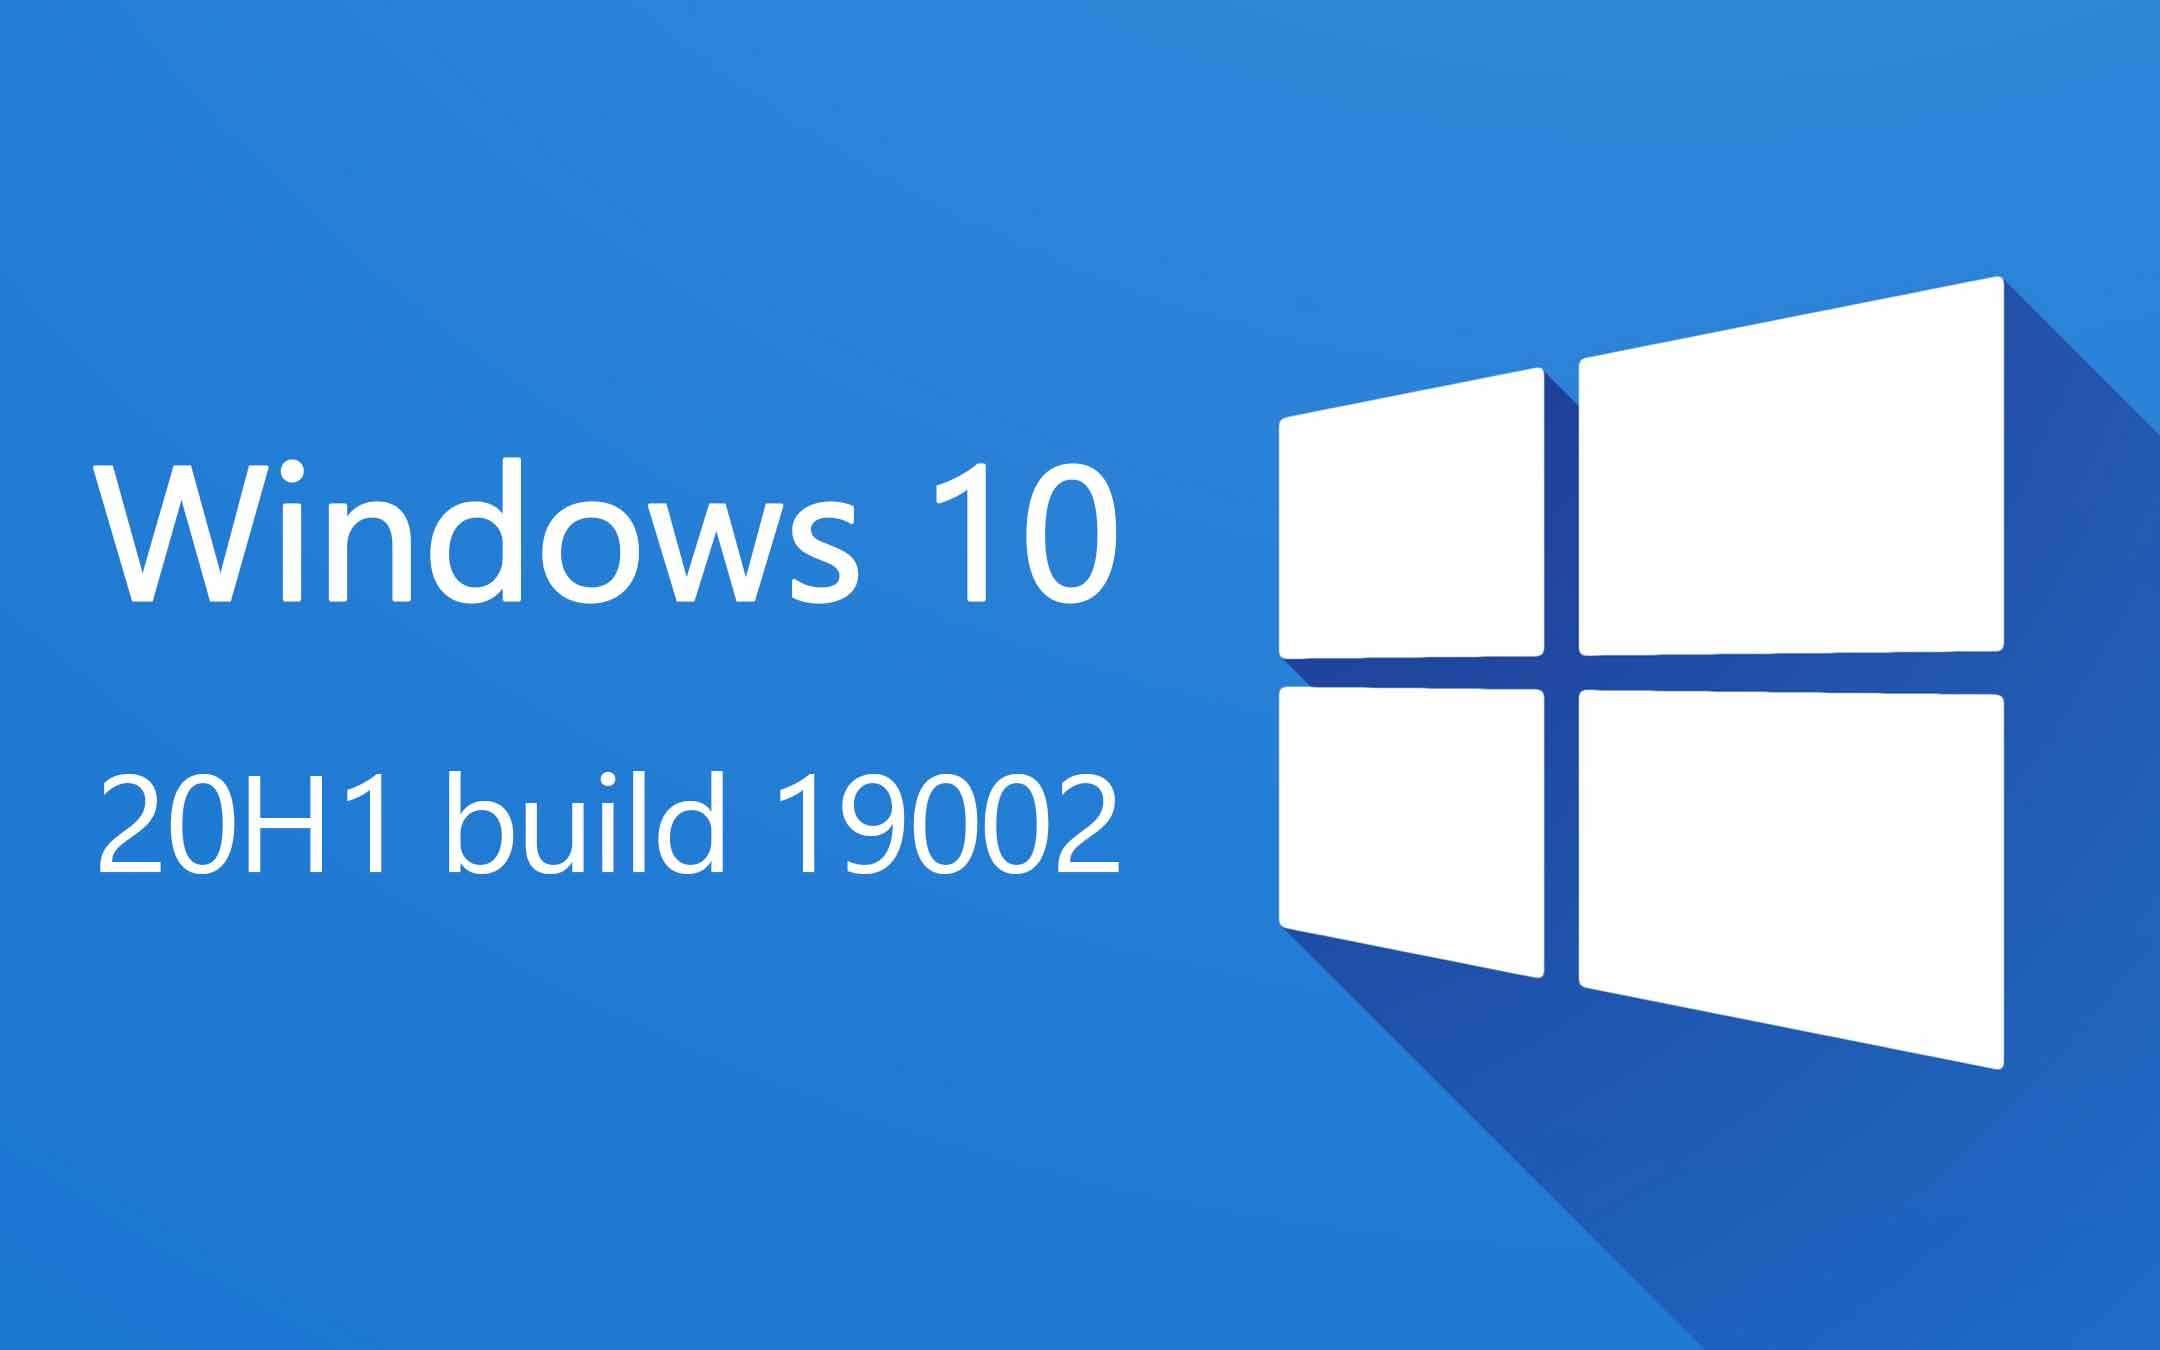 Windows 10 20H1 build 19002